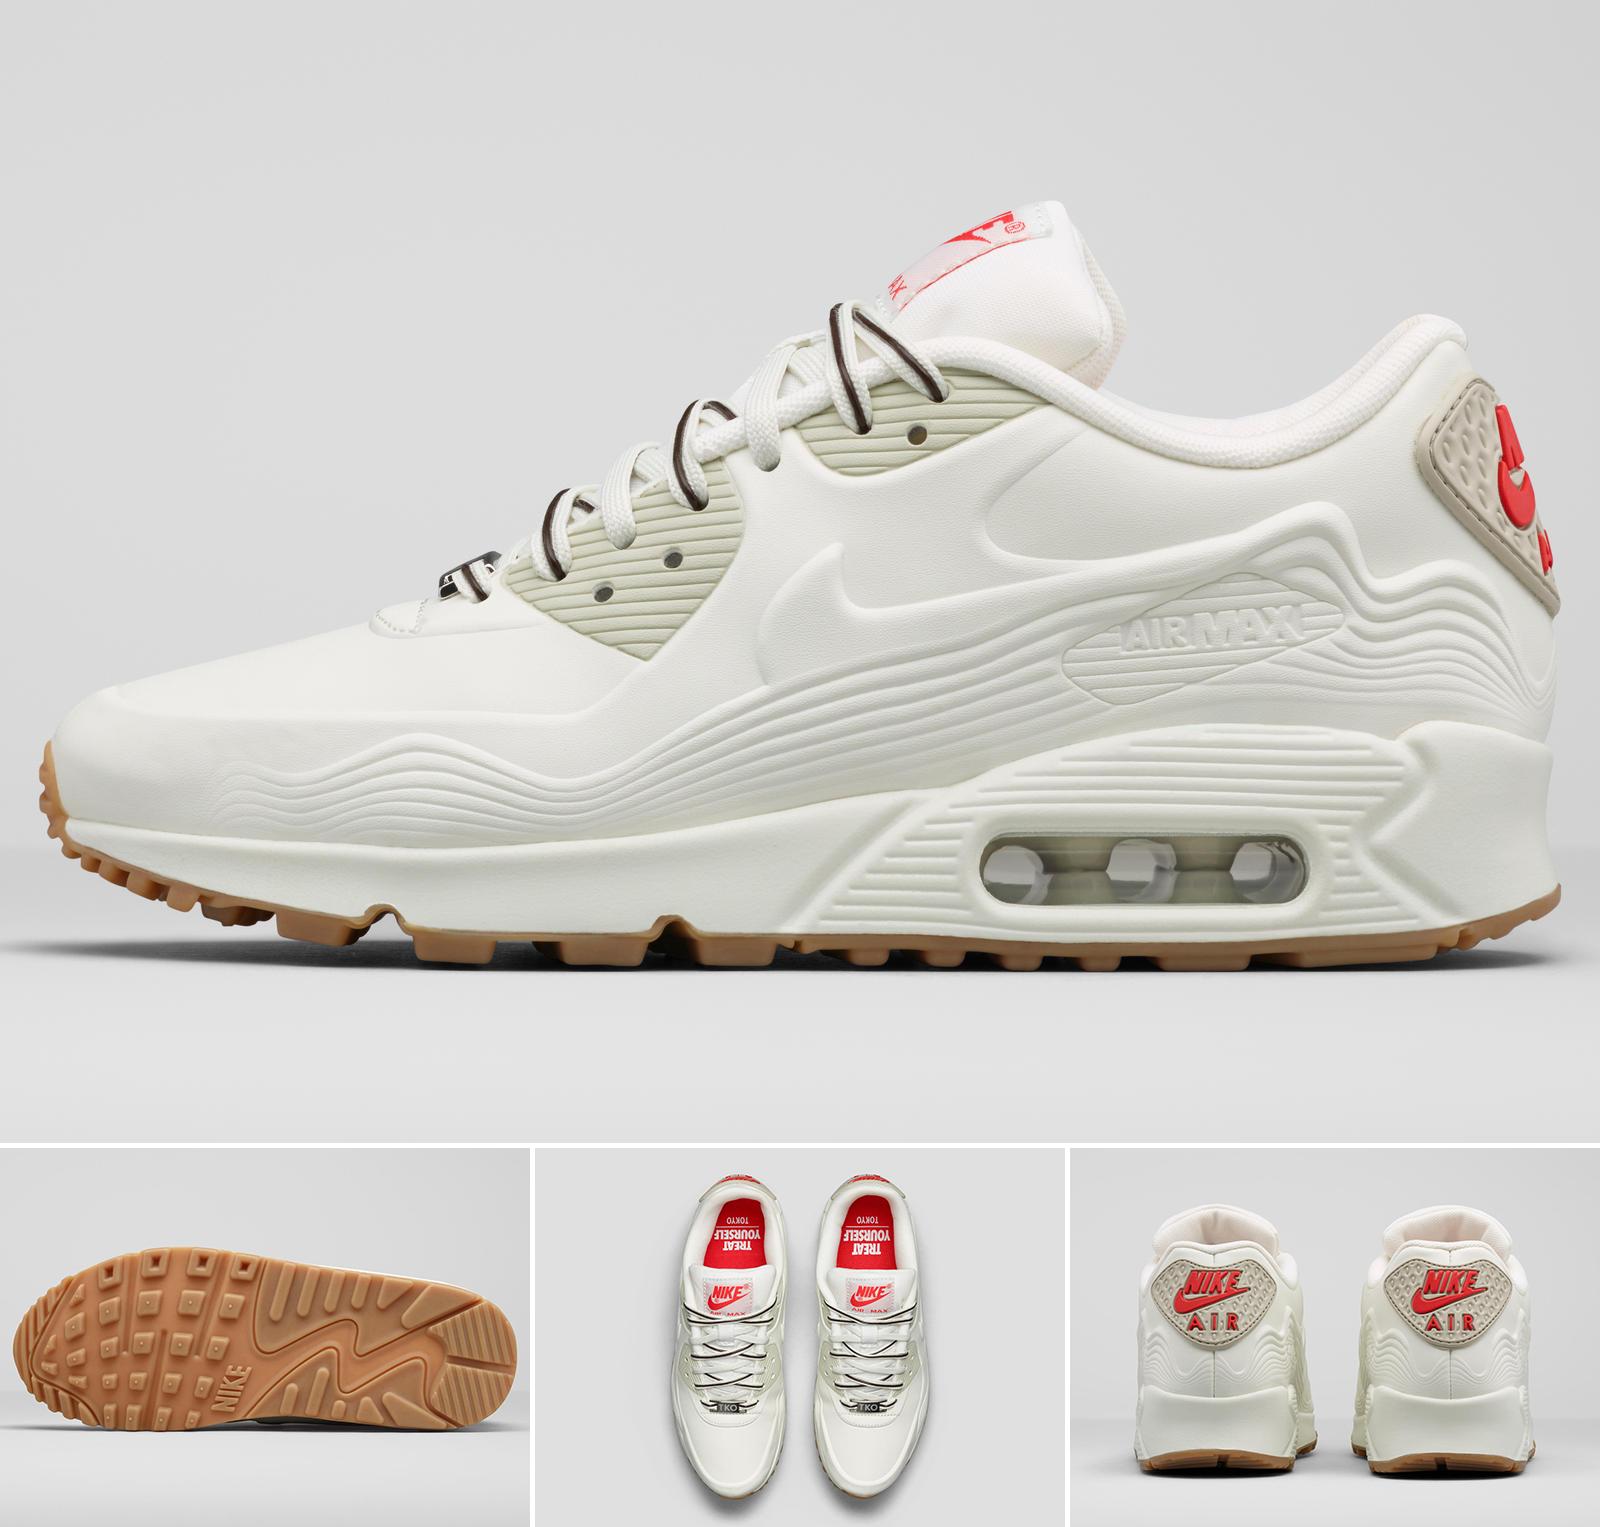 Nike-air-max-90-sweet-city-pack-tokyo-harajuku-crepe-2